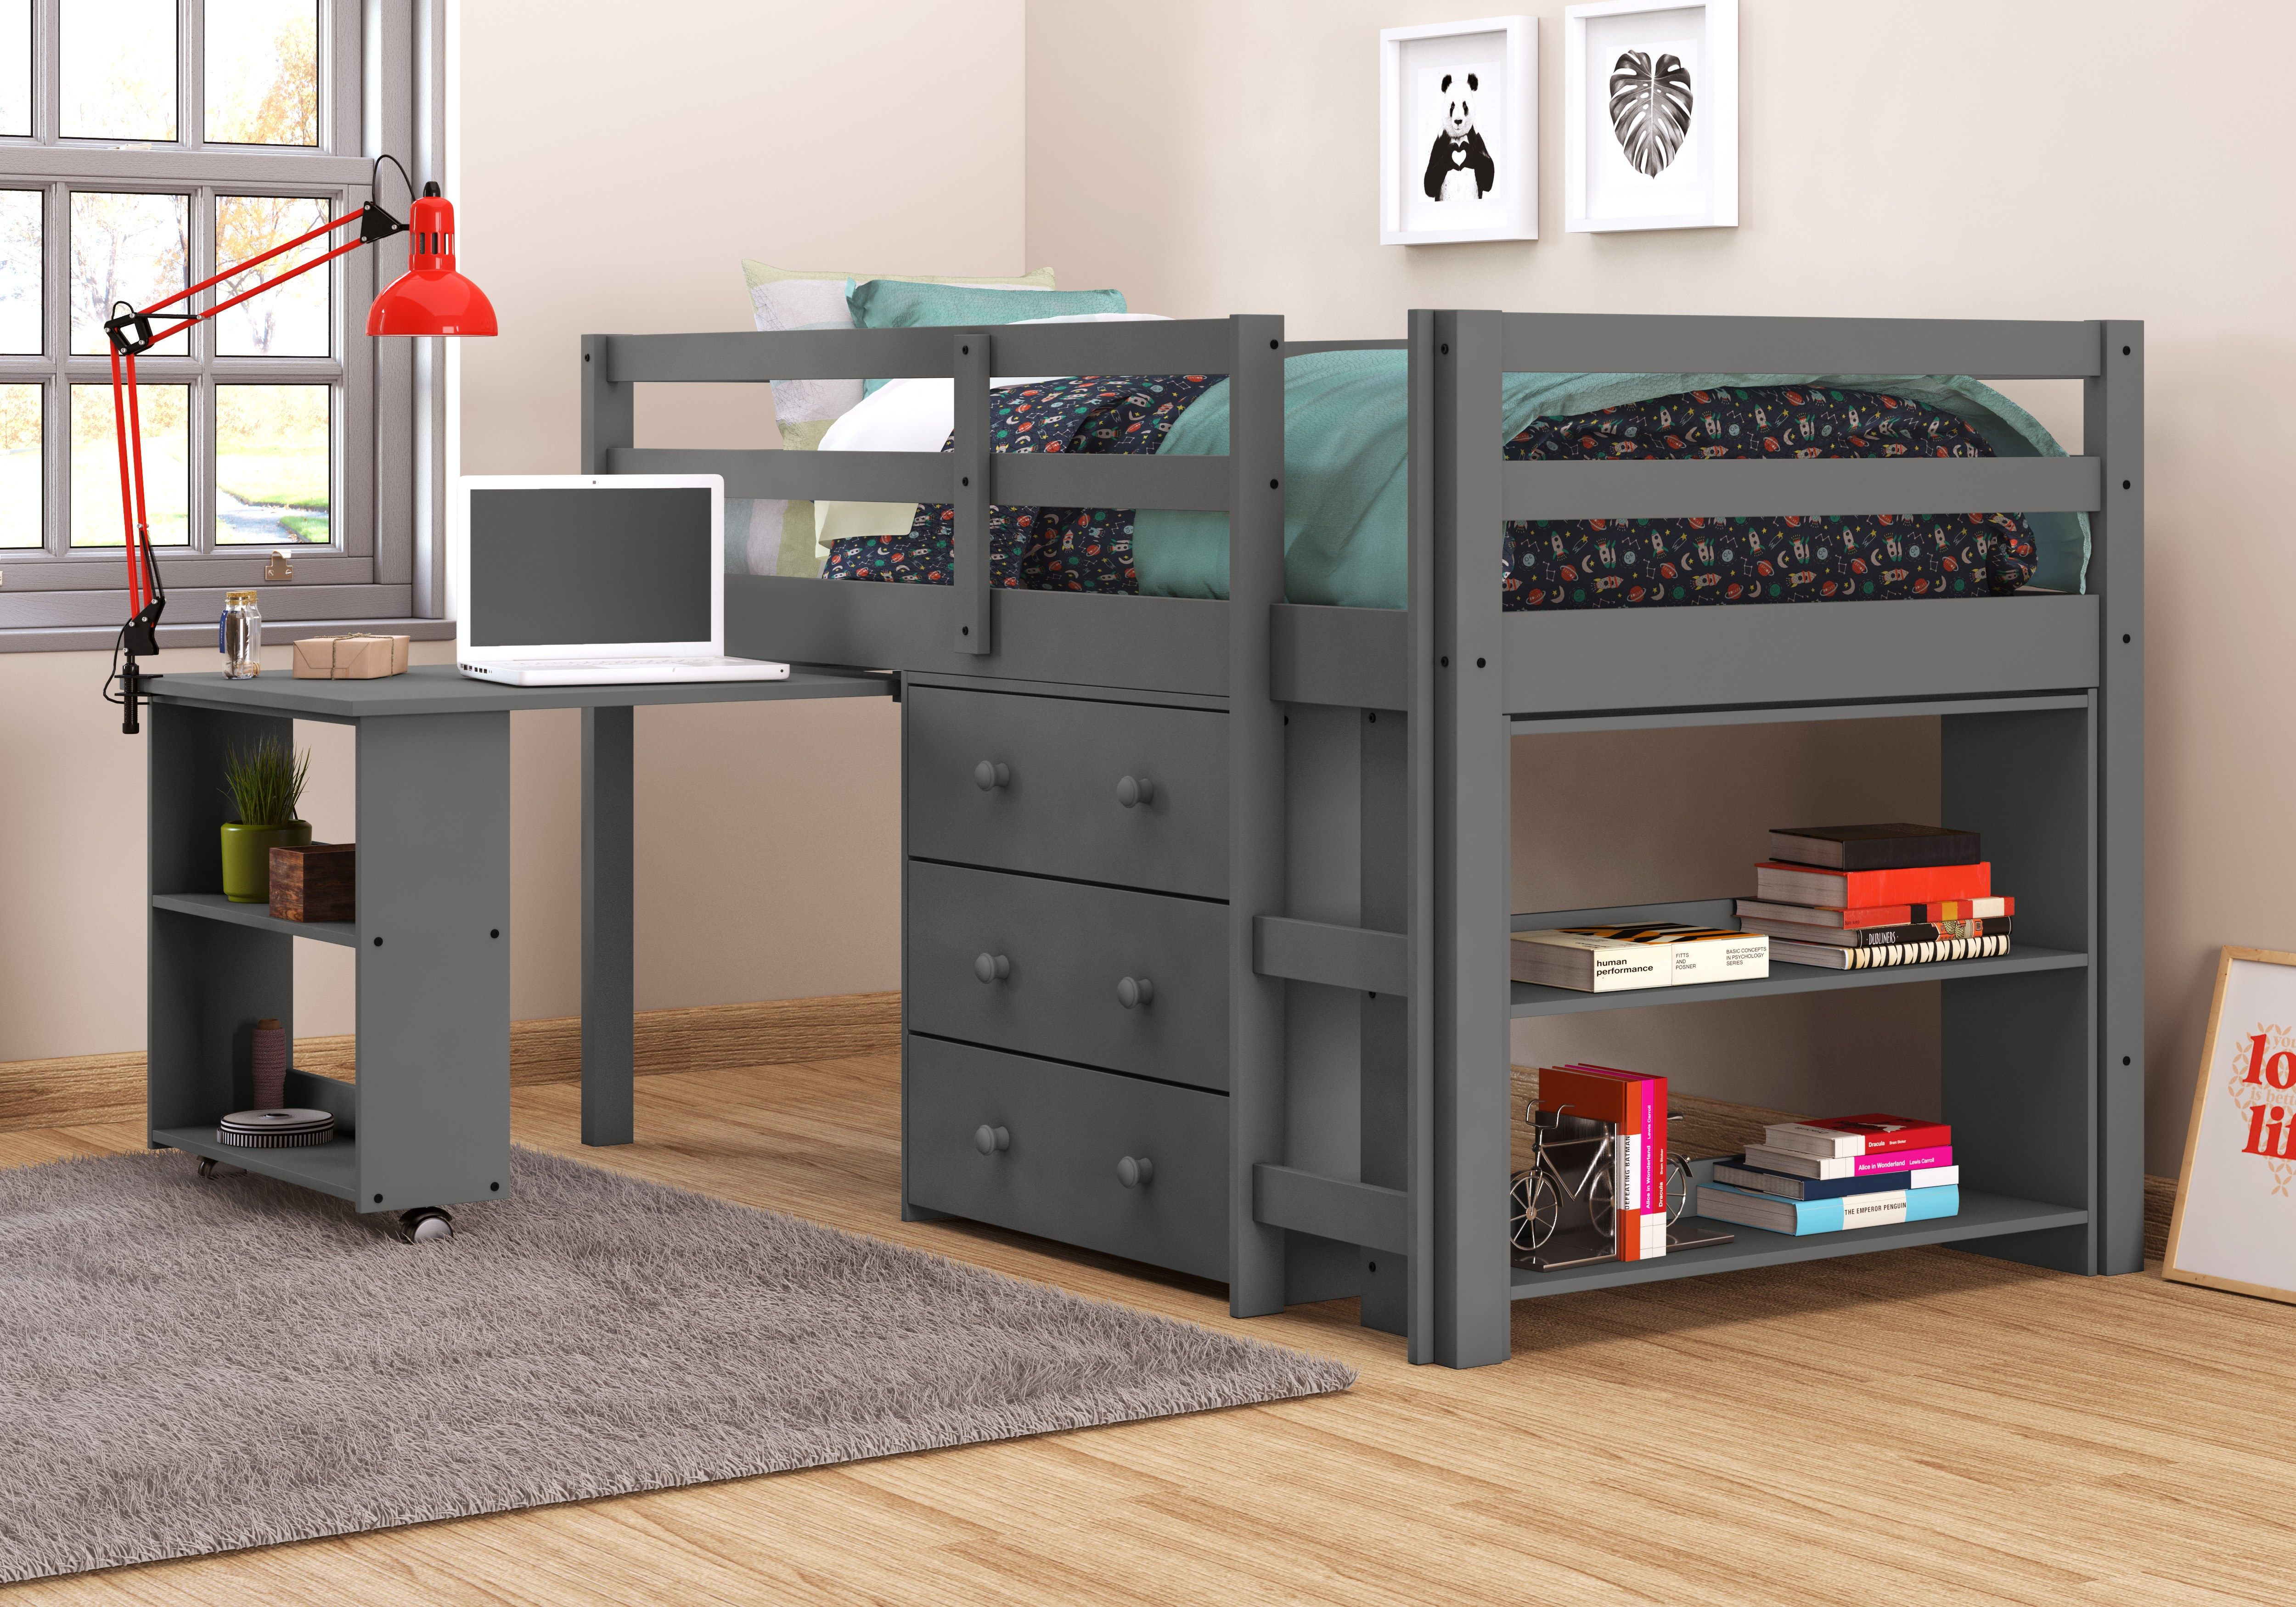 Loft Bed With Desk Home Interior Design Ideas In 2020 Low Loft Beds Cool Loft Beds Kids Loft Beds